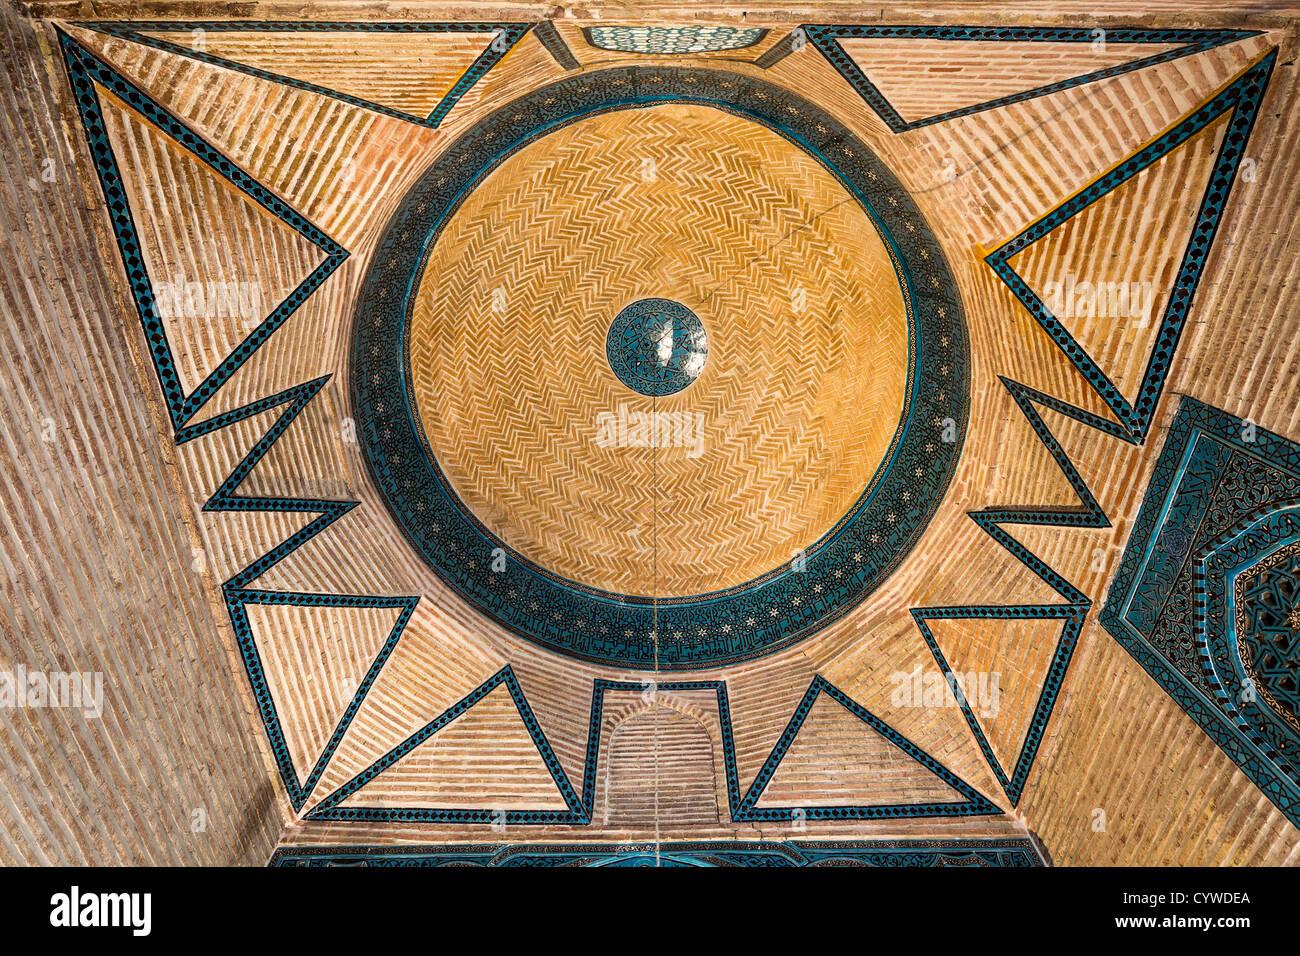 dome of mausoleum, Sahib Ata complex, Konya, Turkey - Stock Image